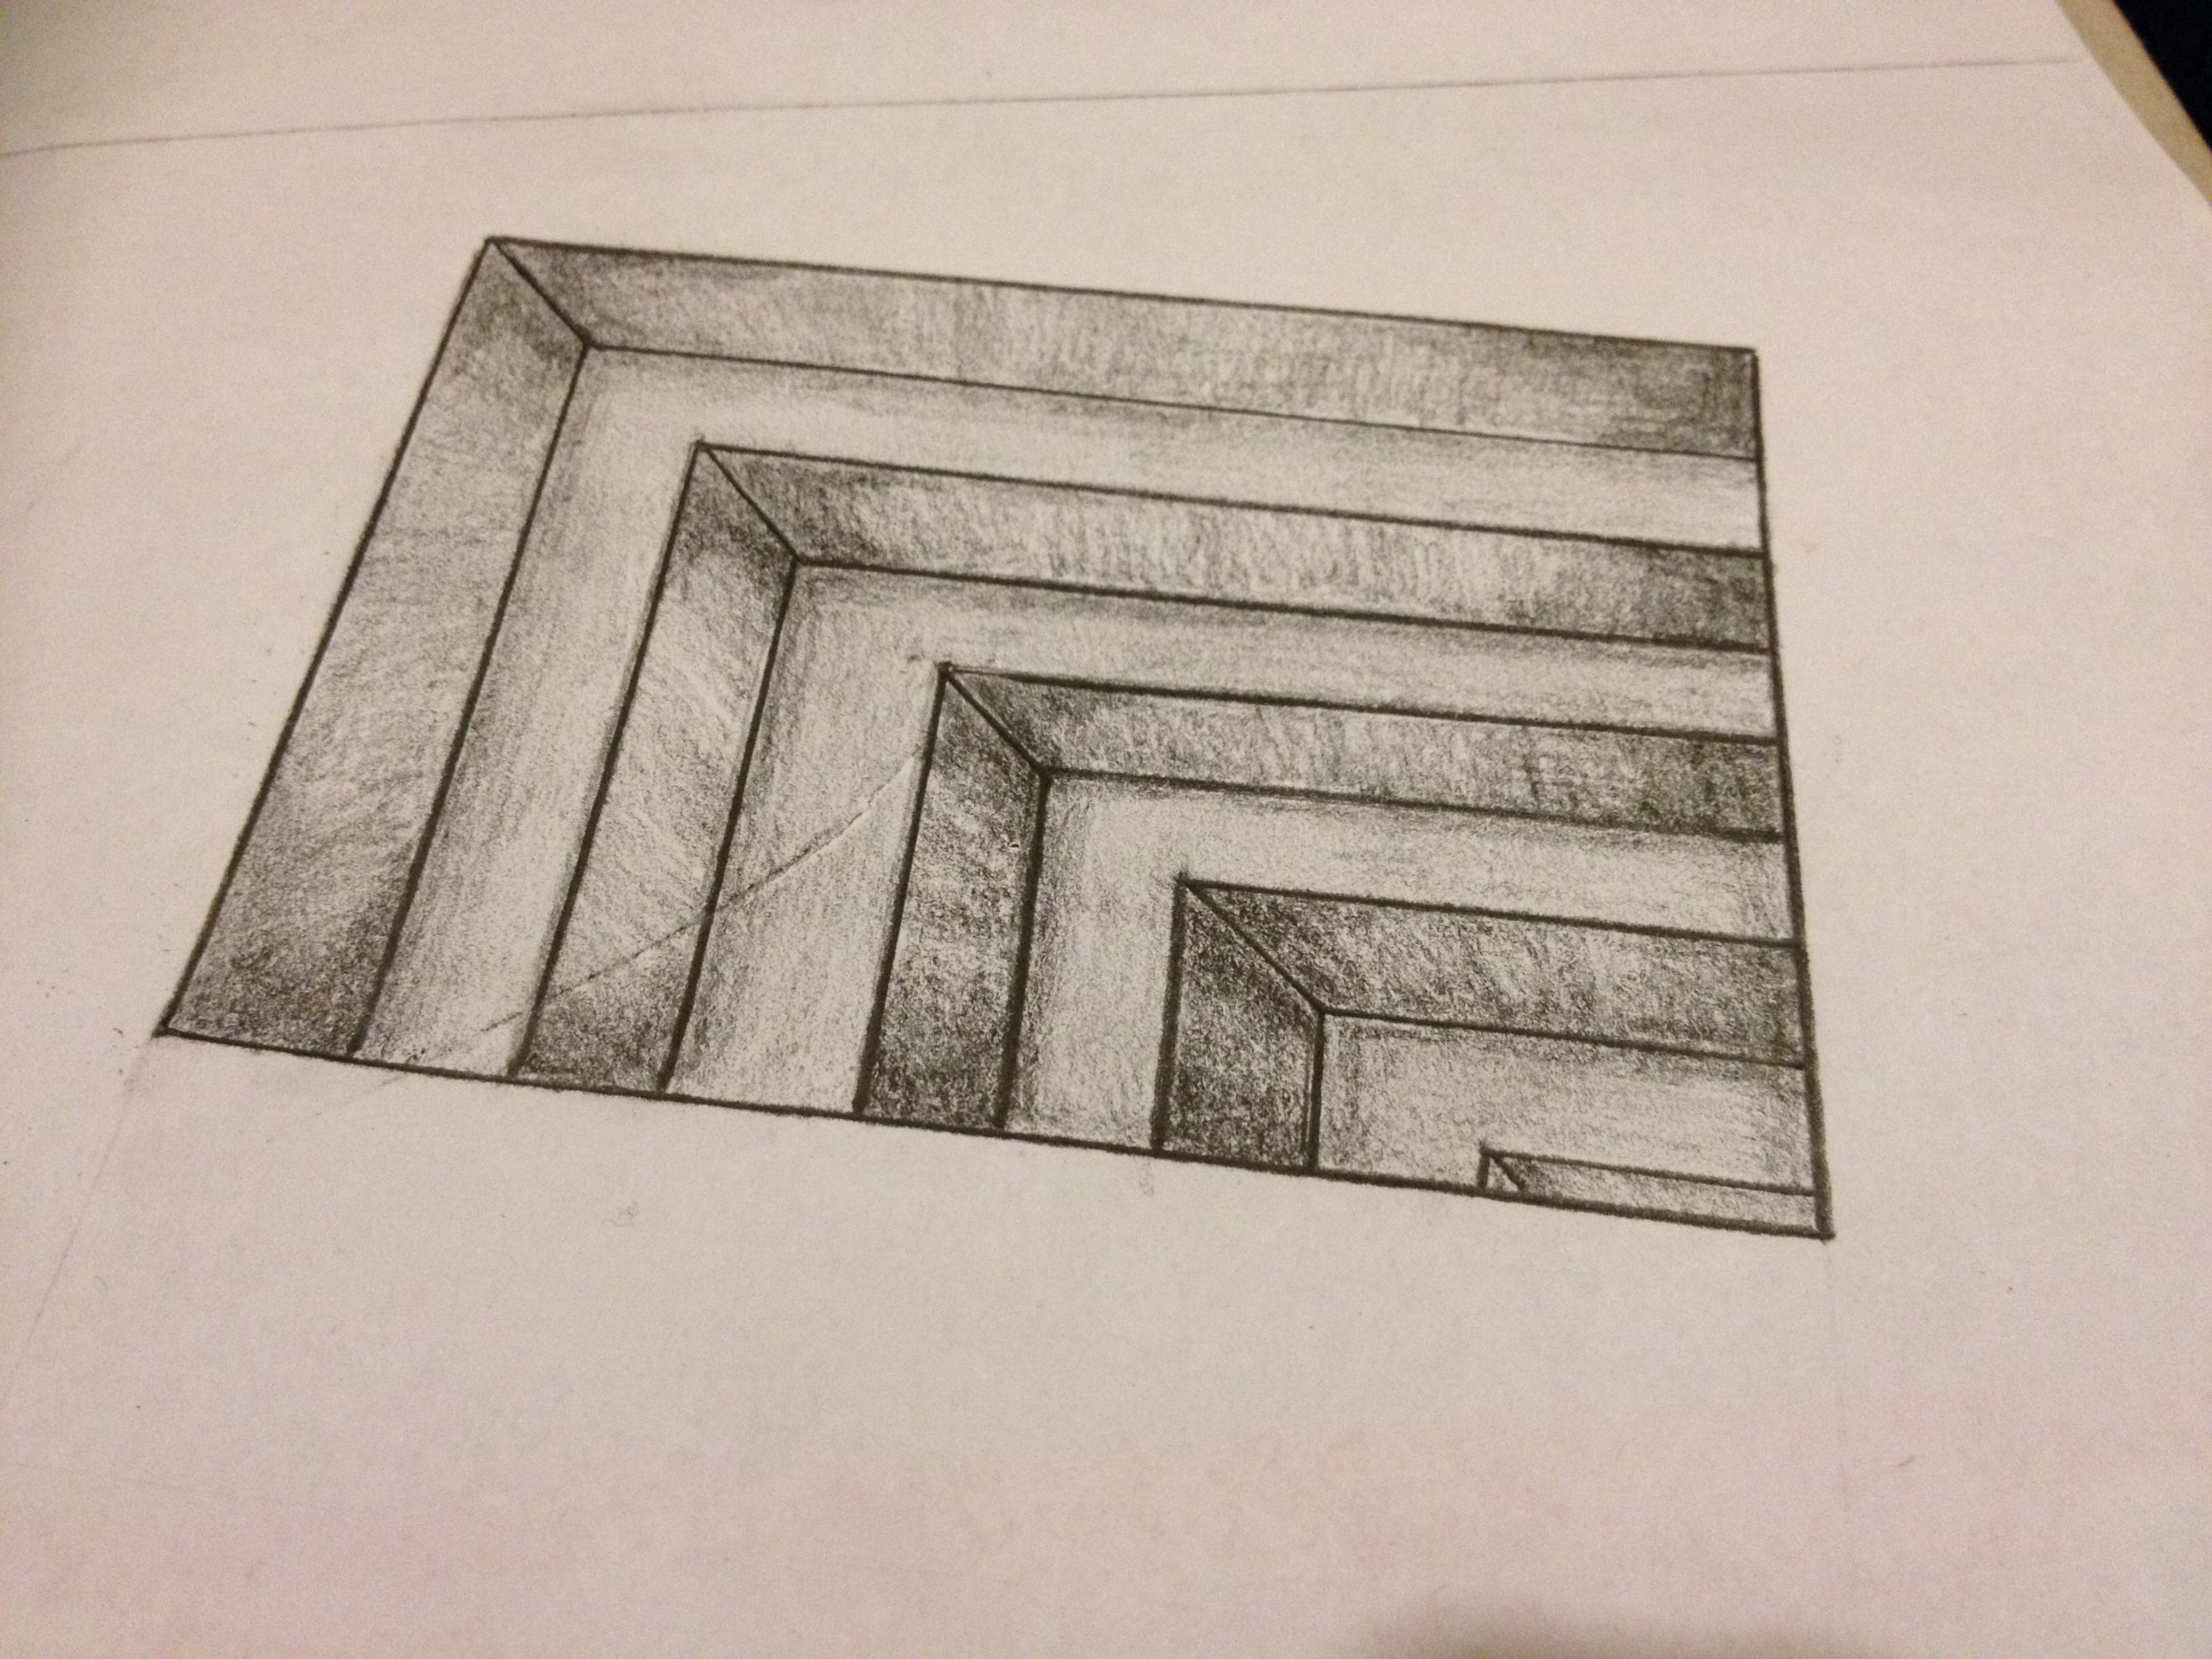 3264x2448 Simple 3d Sketching Ideas Simple 3d Sketching Ideas Simple 3d